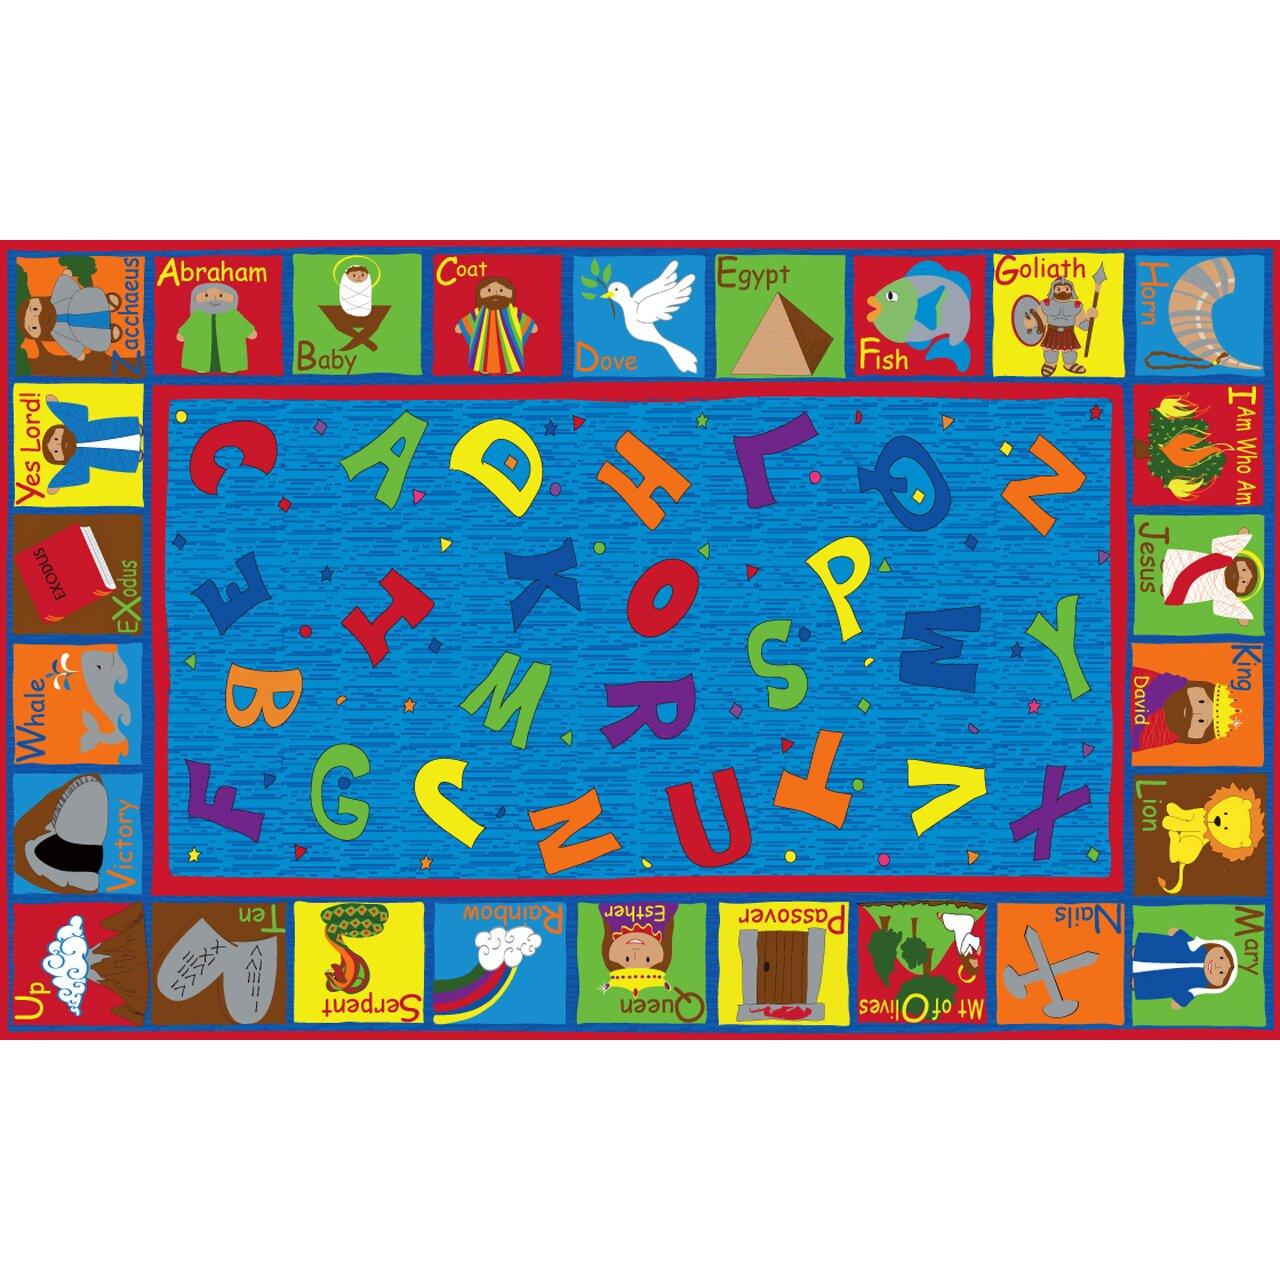 Kid Carpet Bible Sunday School With ABCs Blue Area Rug